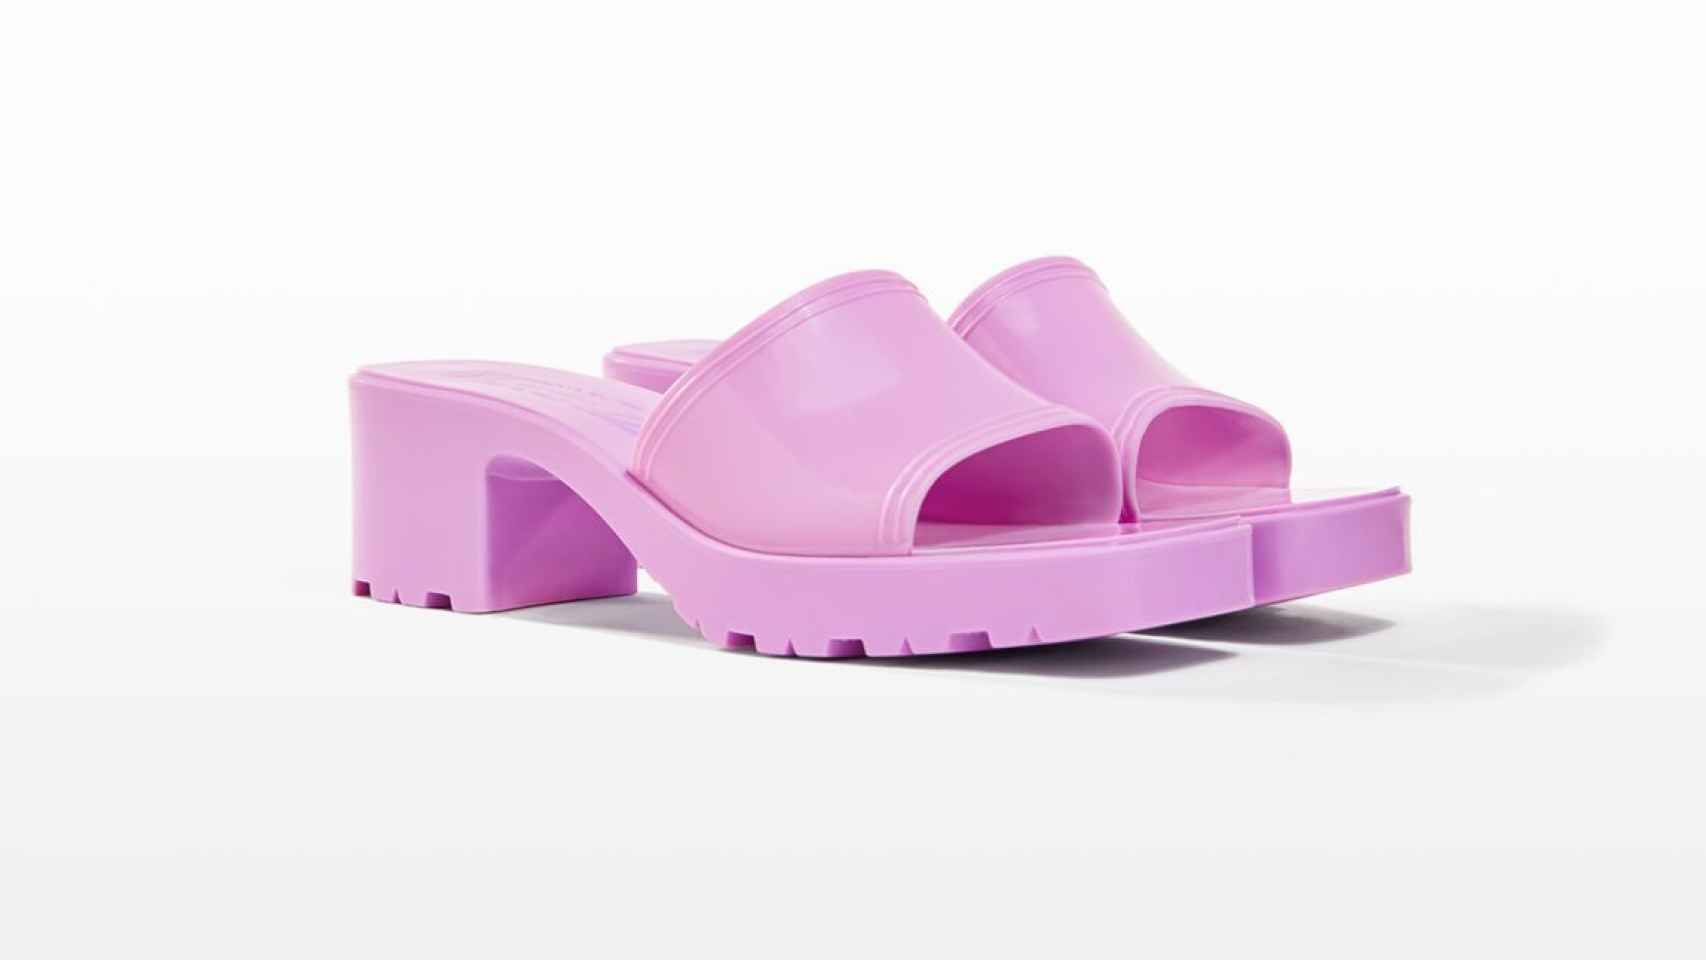 Nueve modelos de calzado de Bershka por menos de 20 euros que querrás tener